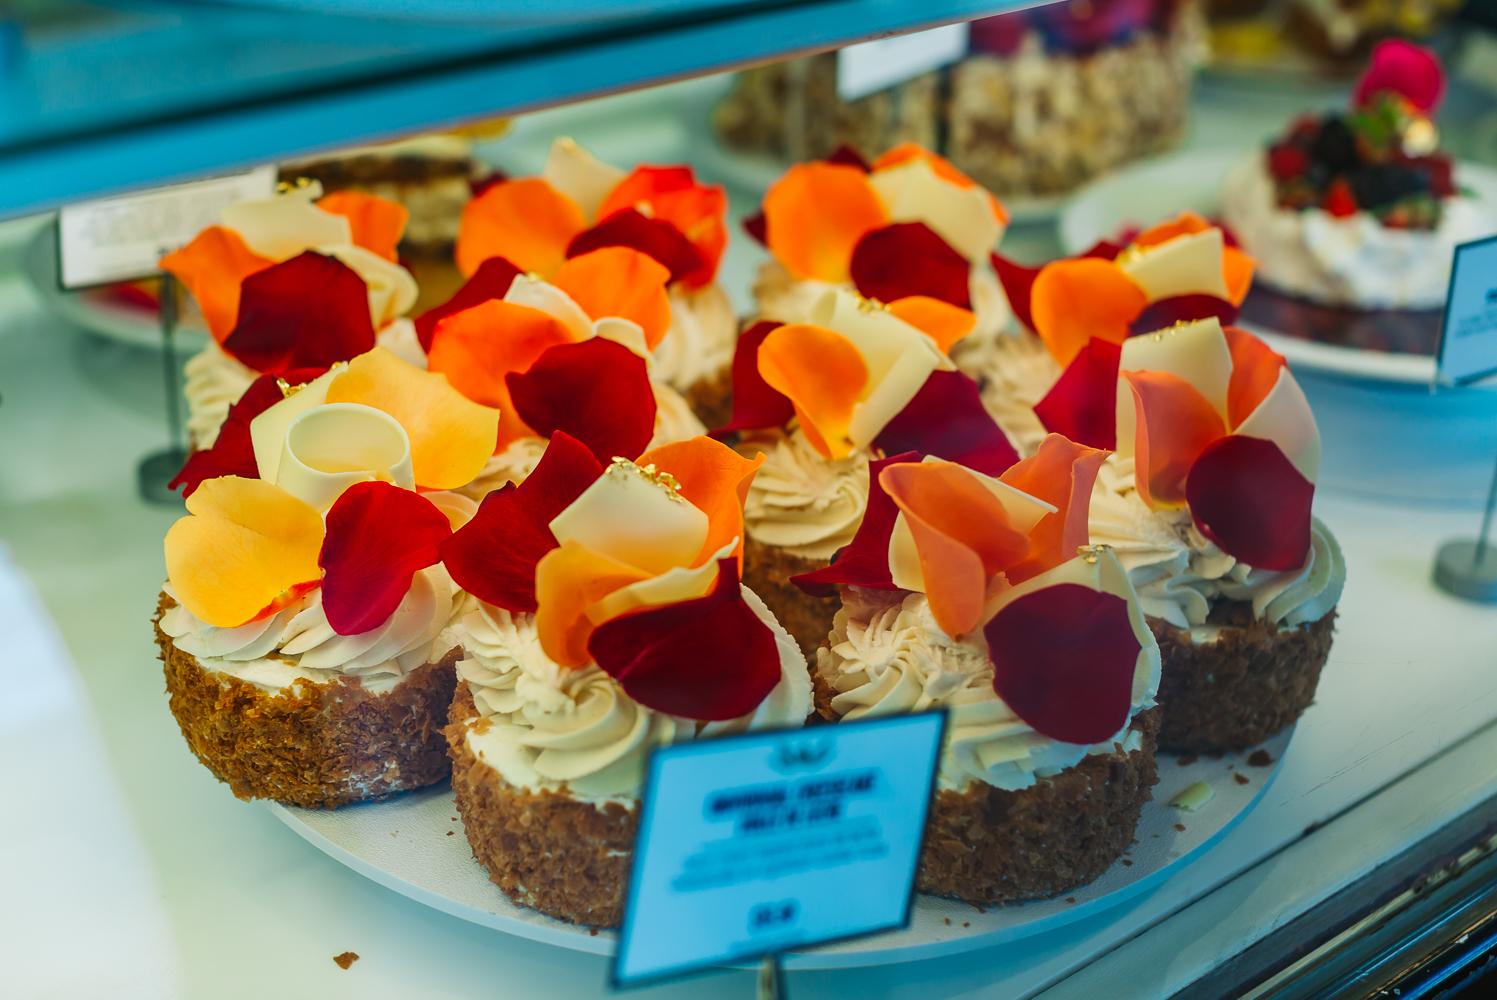 Beautiful desserts at Extraordinary Desserts